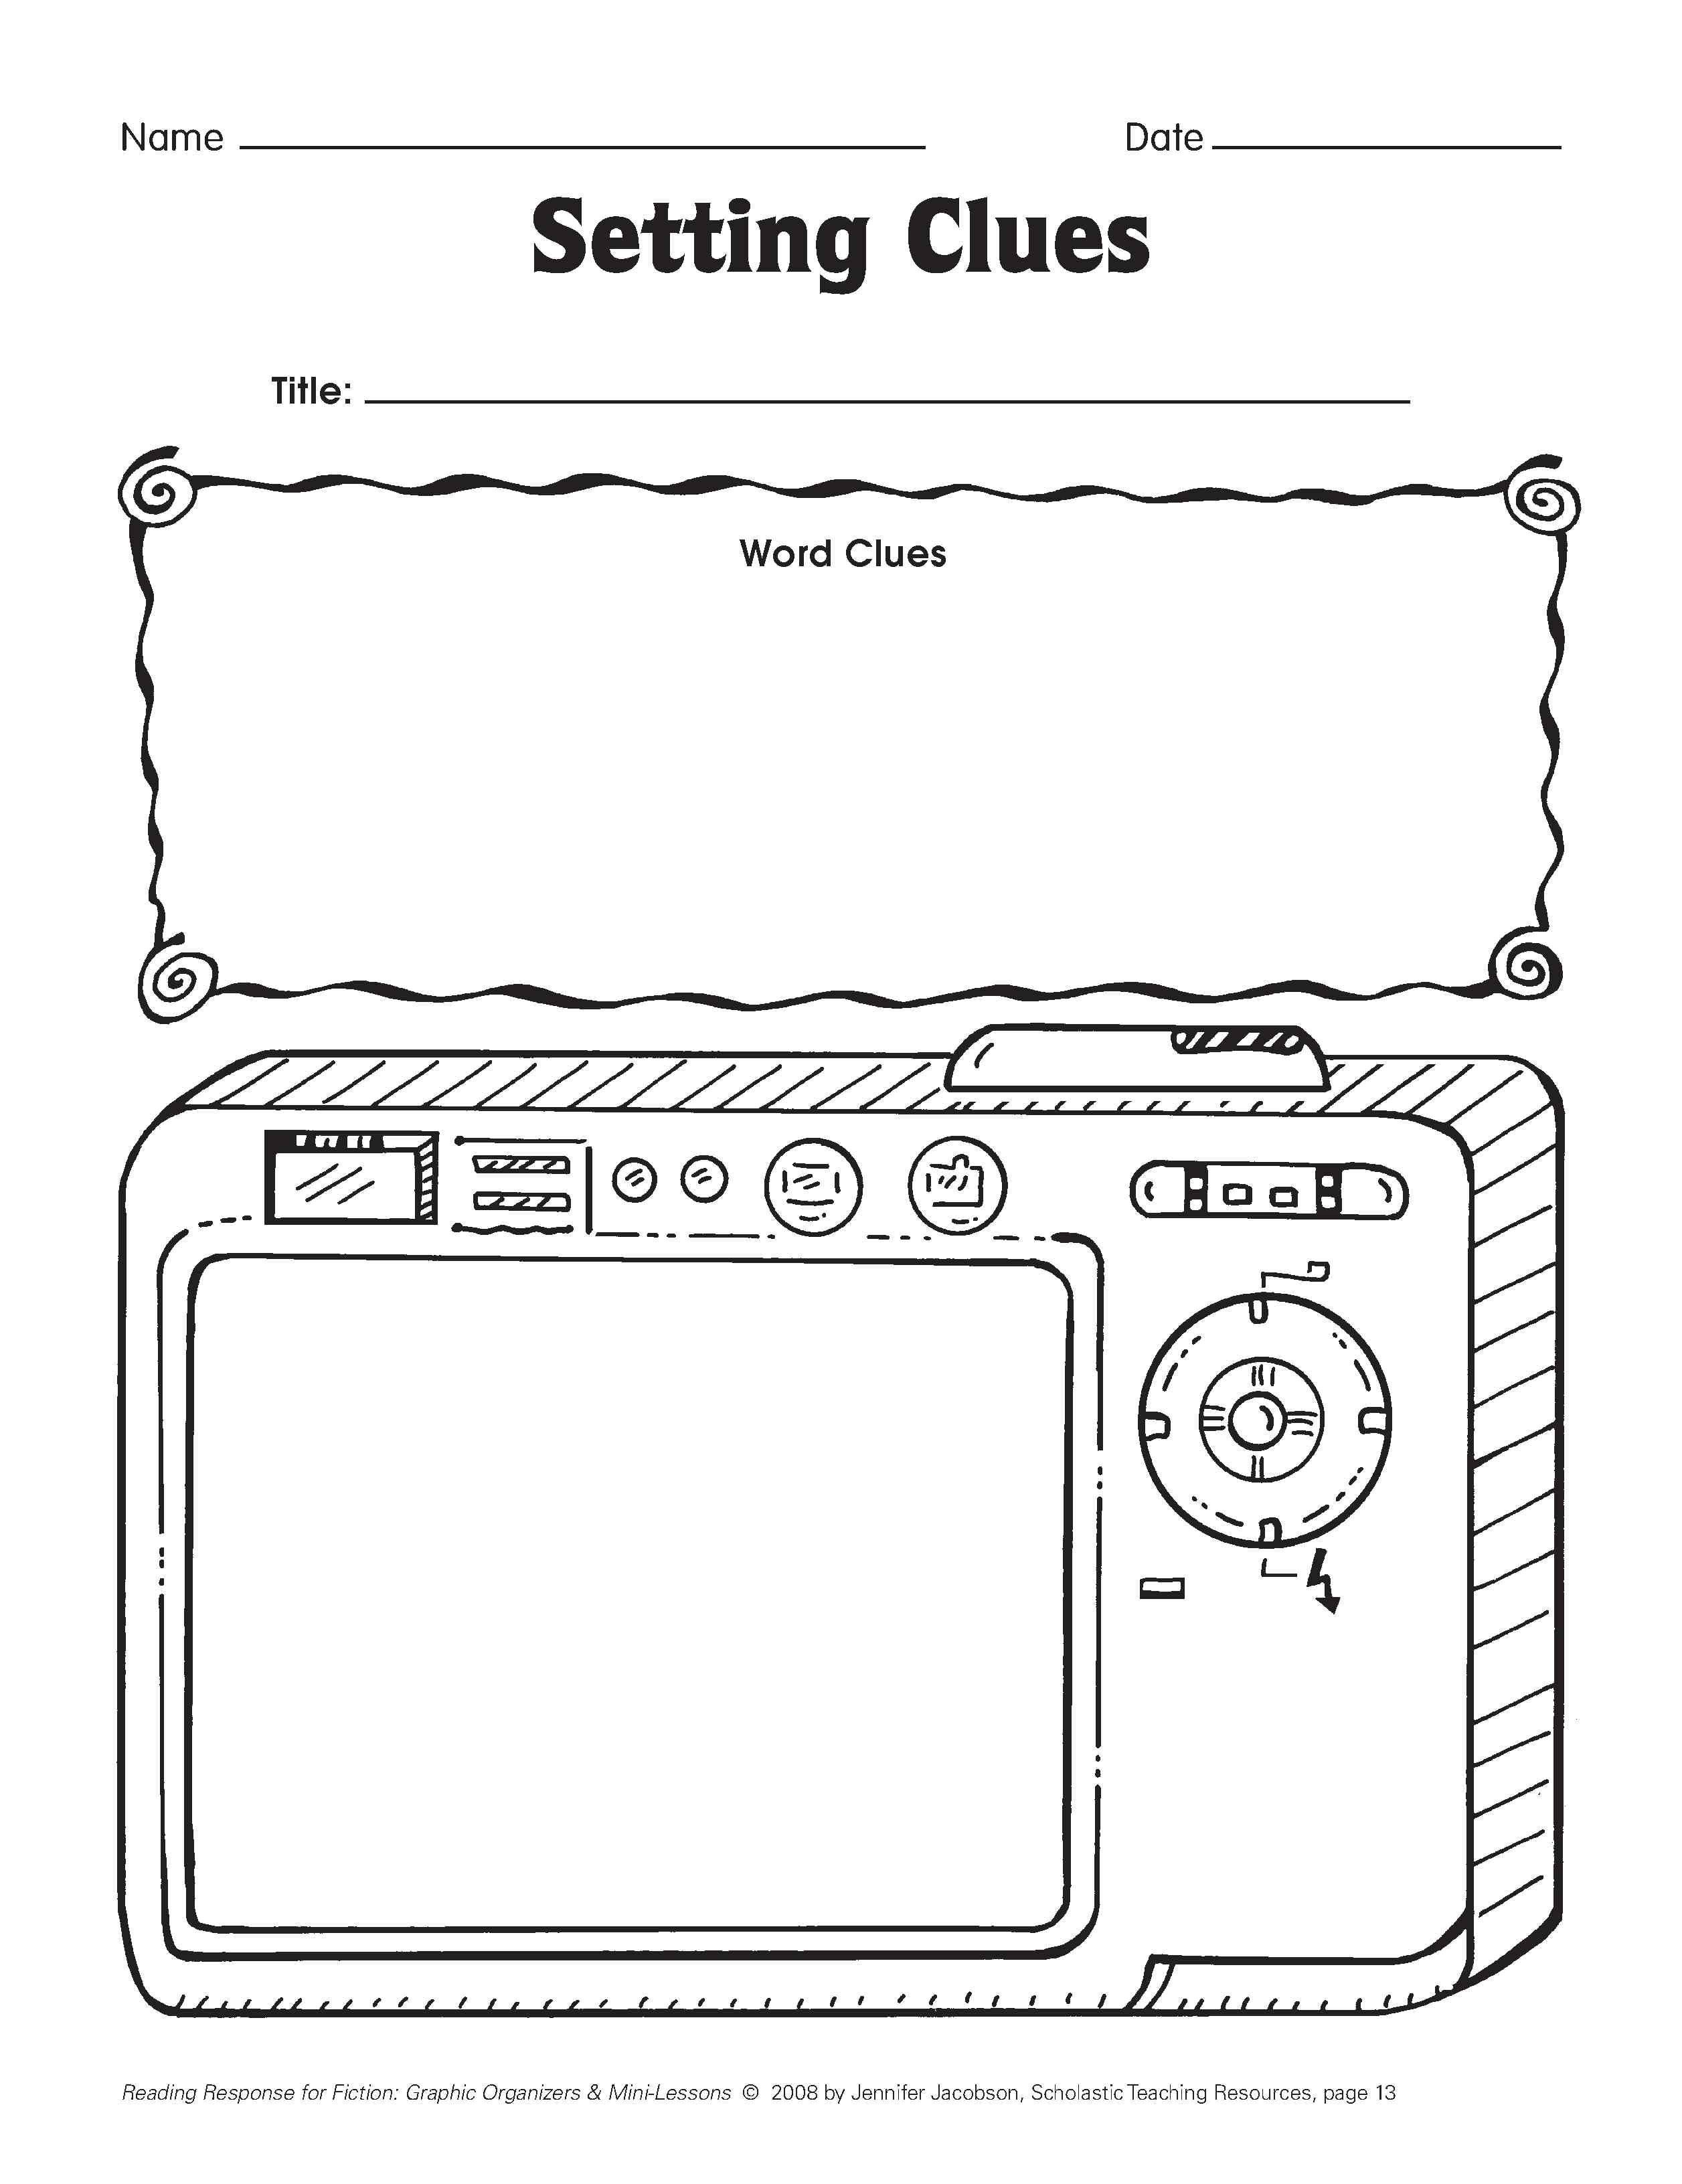 Five Minute Reading Responses | Scholastic Free Printable On - Scholastic Free Printables